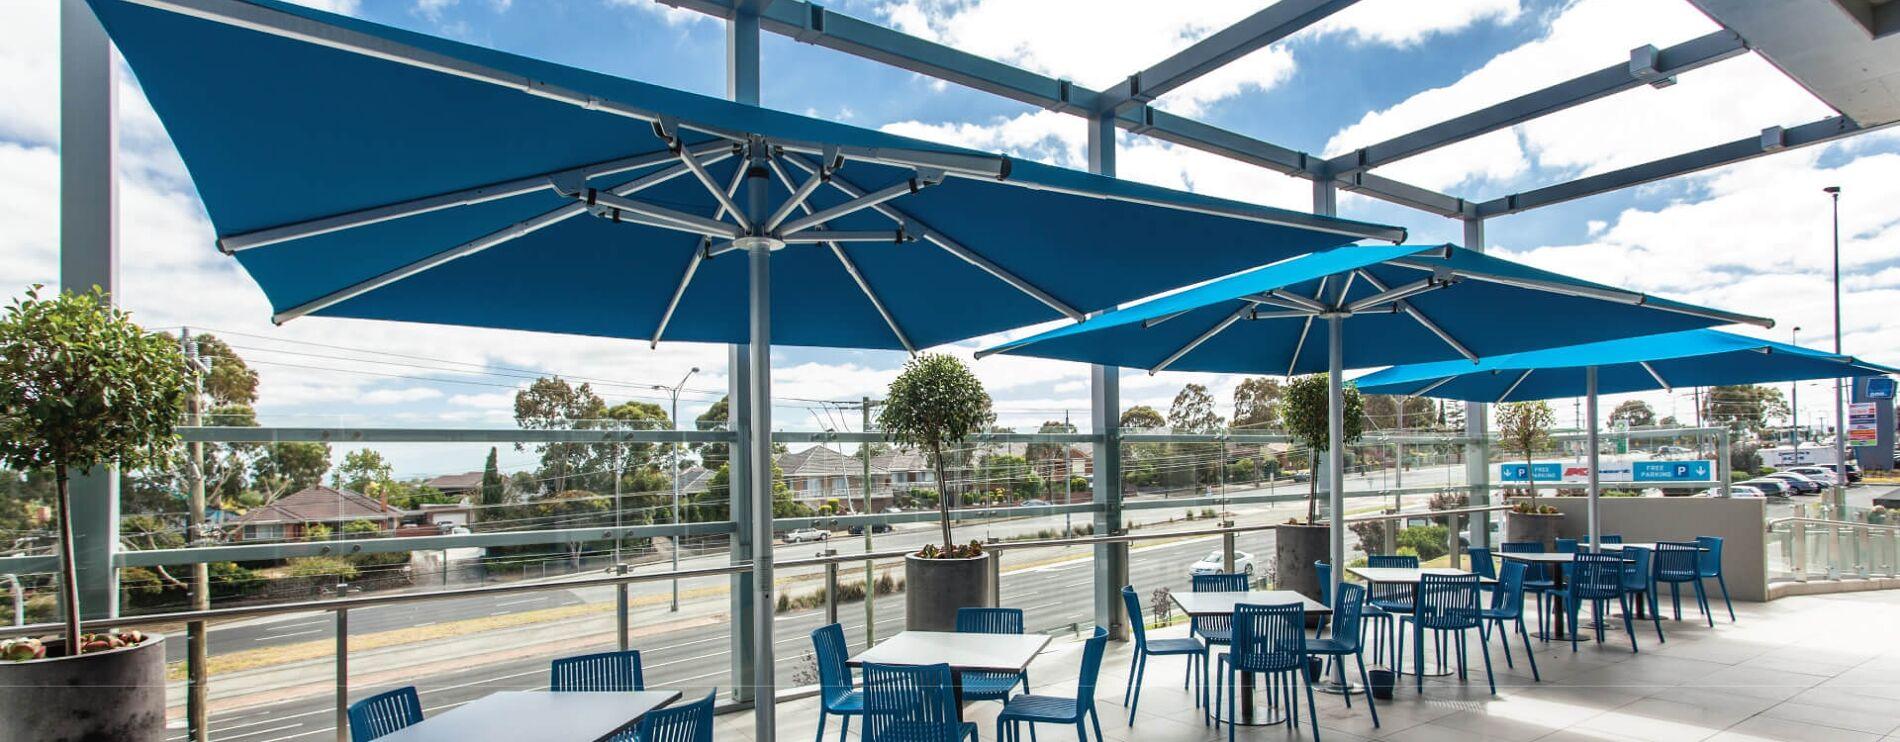 Giant Commercial Outdoor Umbrellas